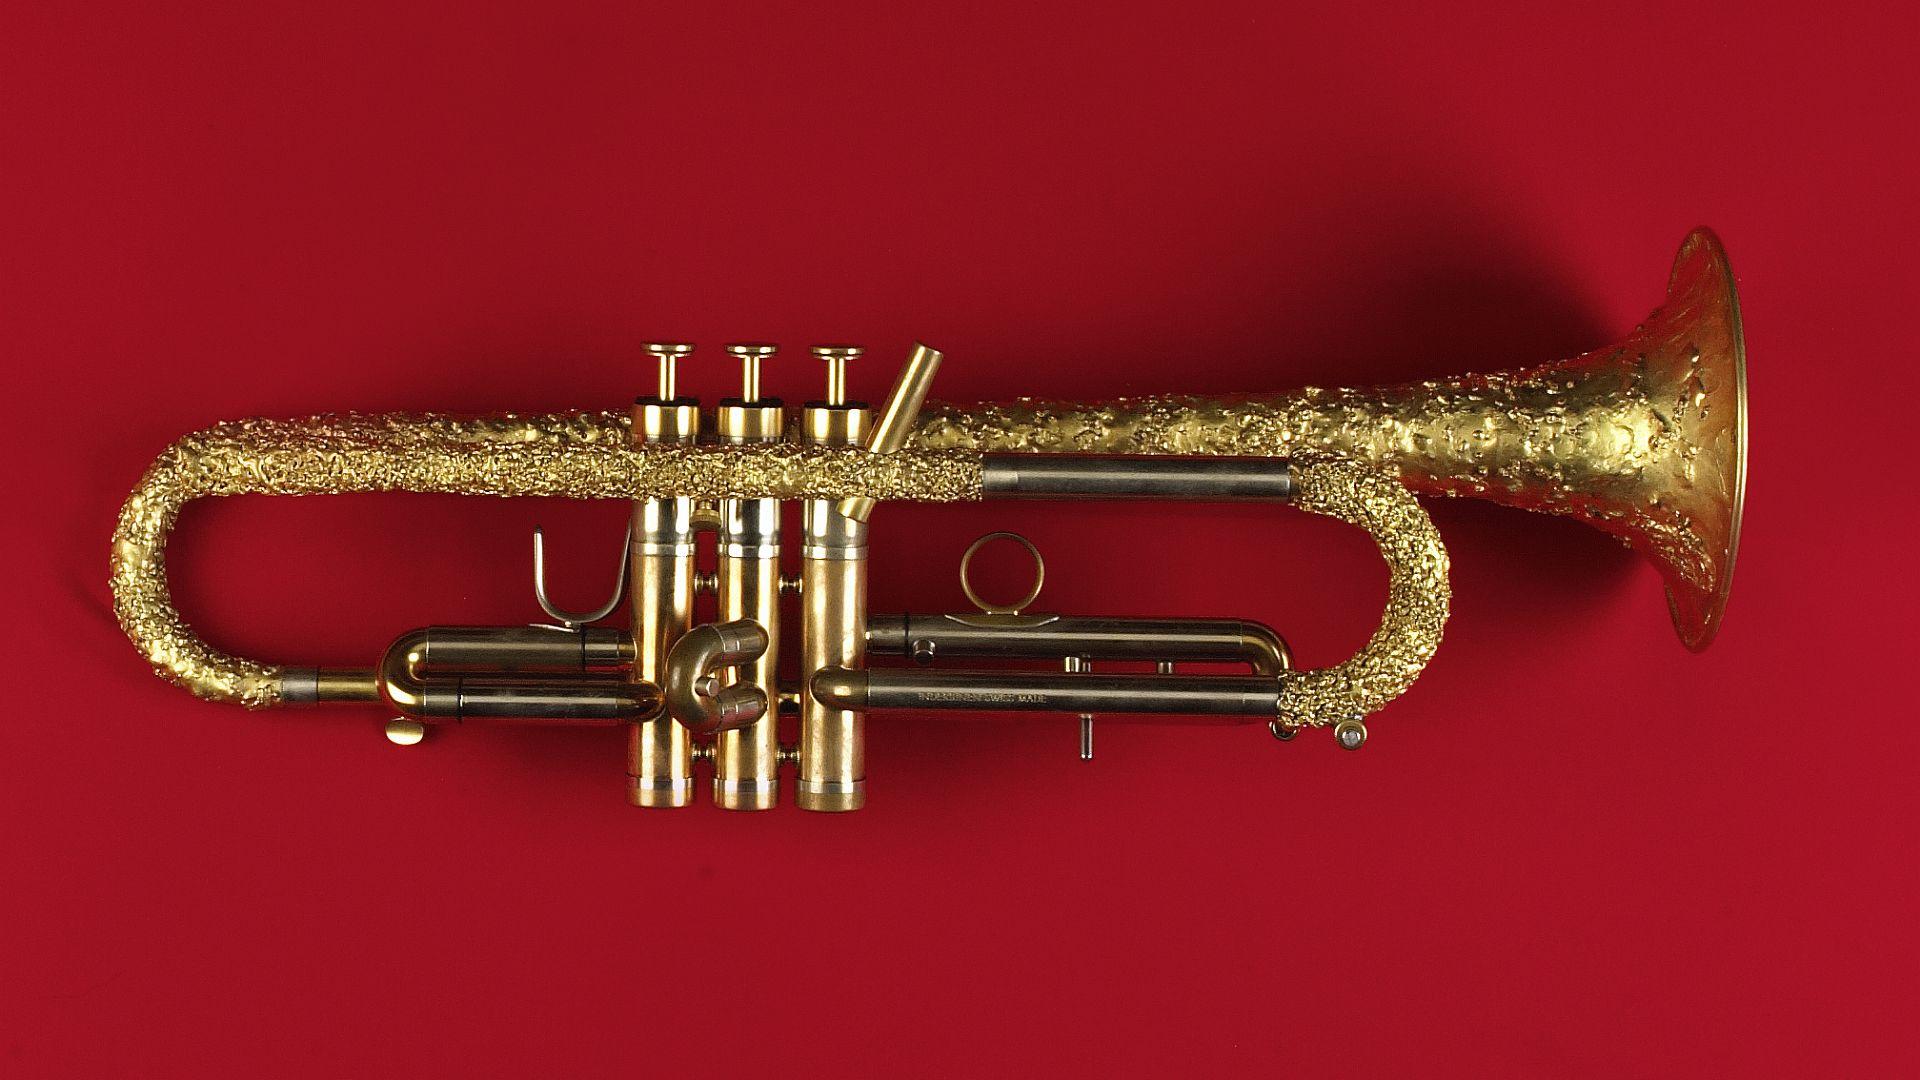 trompete_davinci_1920x1080px